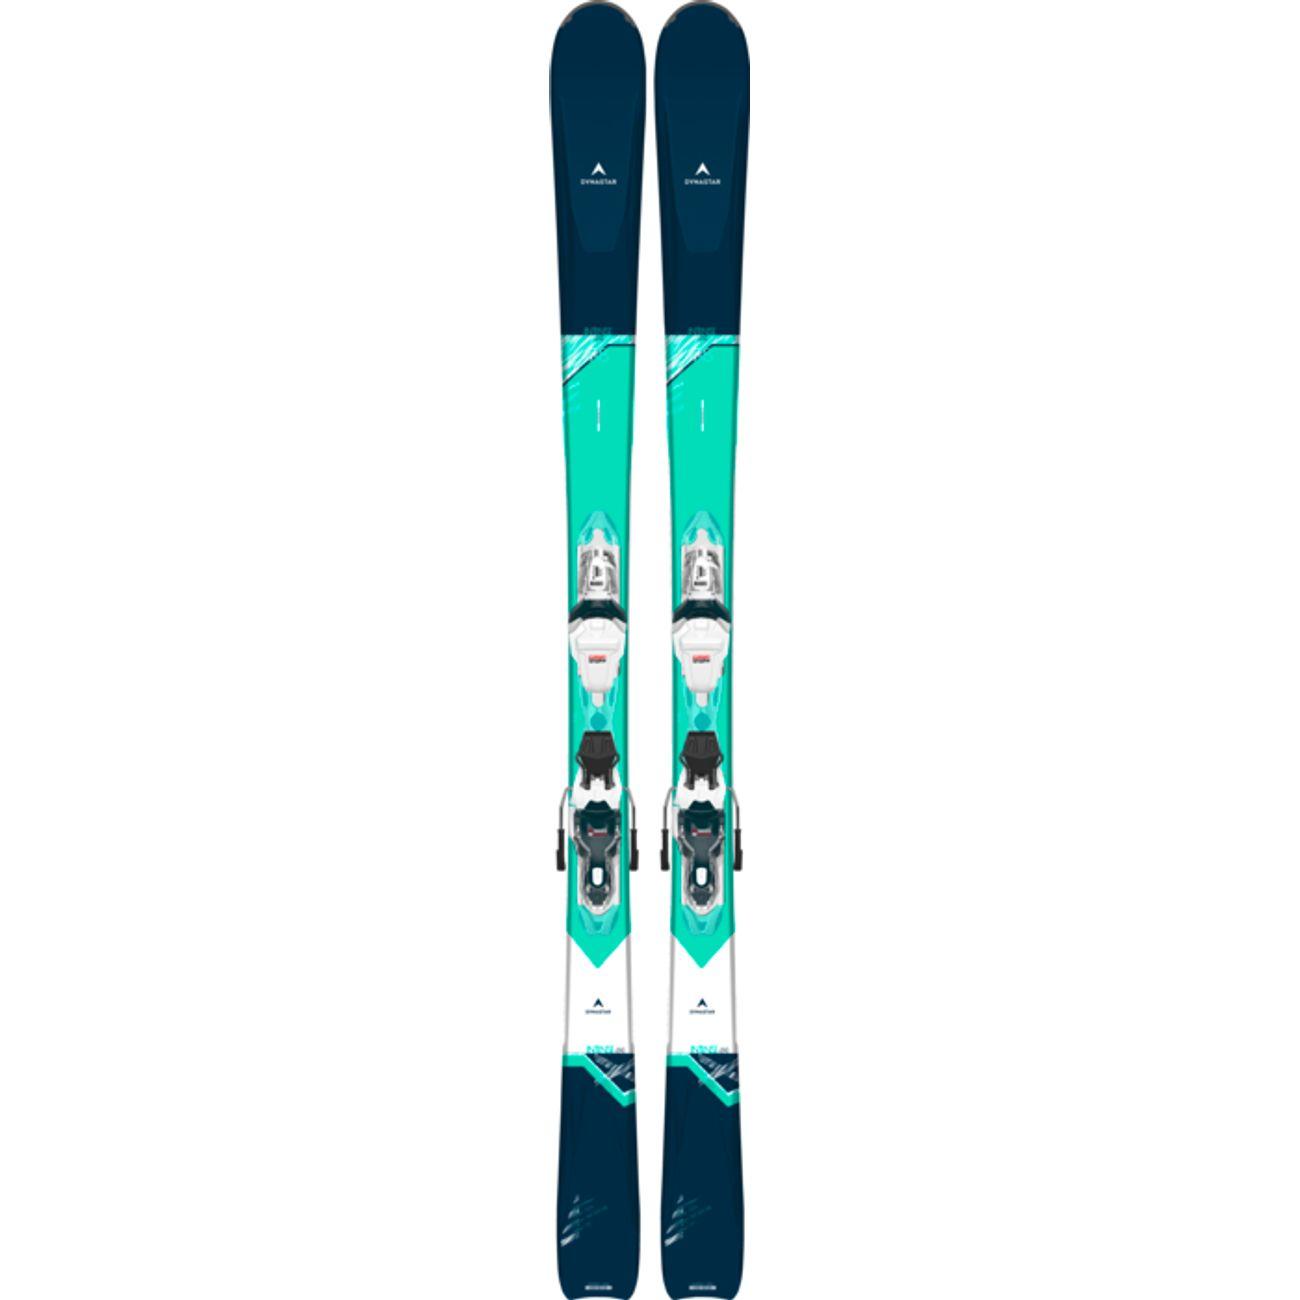 SKIS Ski adulte DYNASTAR INTENSE 4X4 78 XPRESS W 10 B83